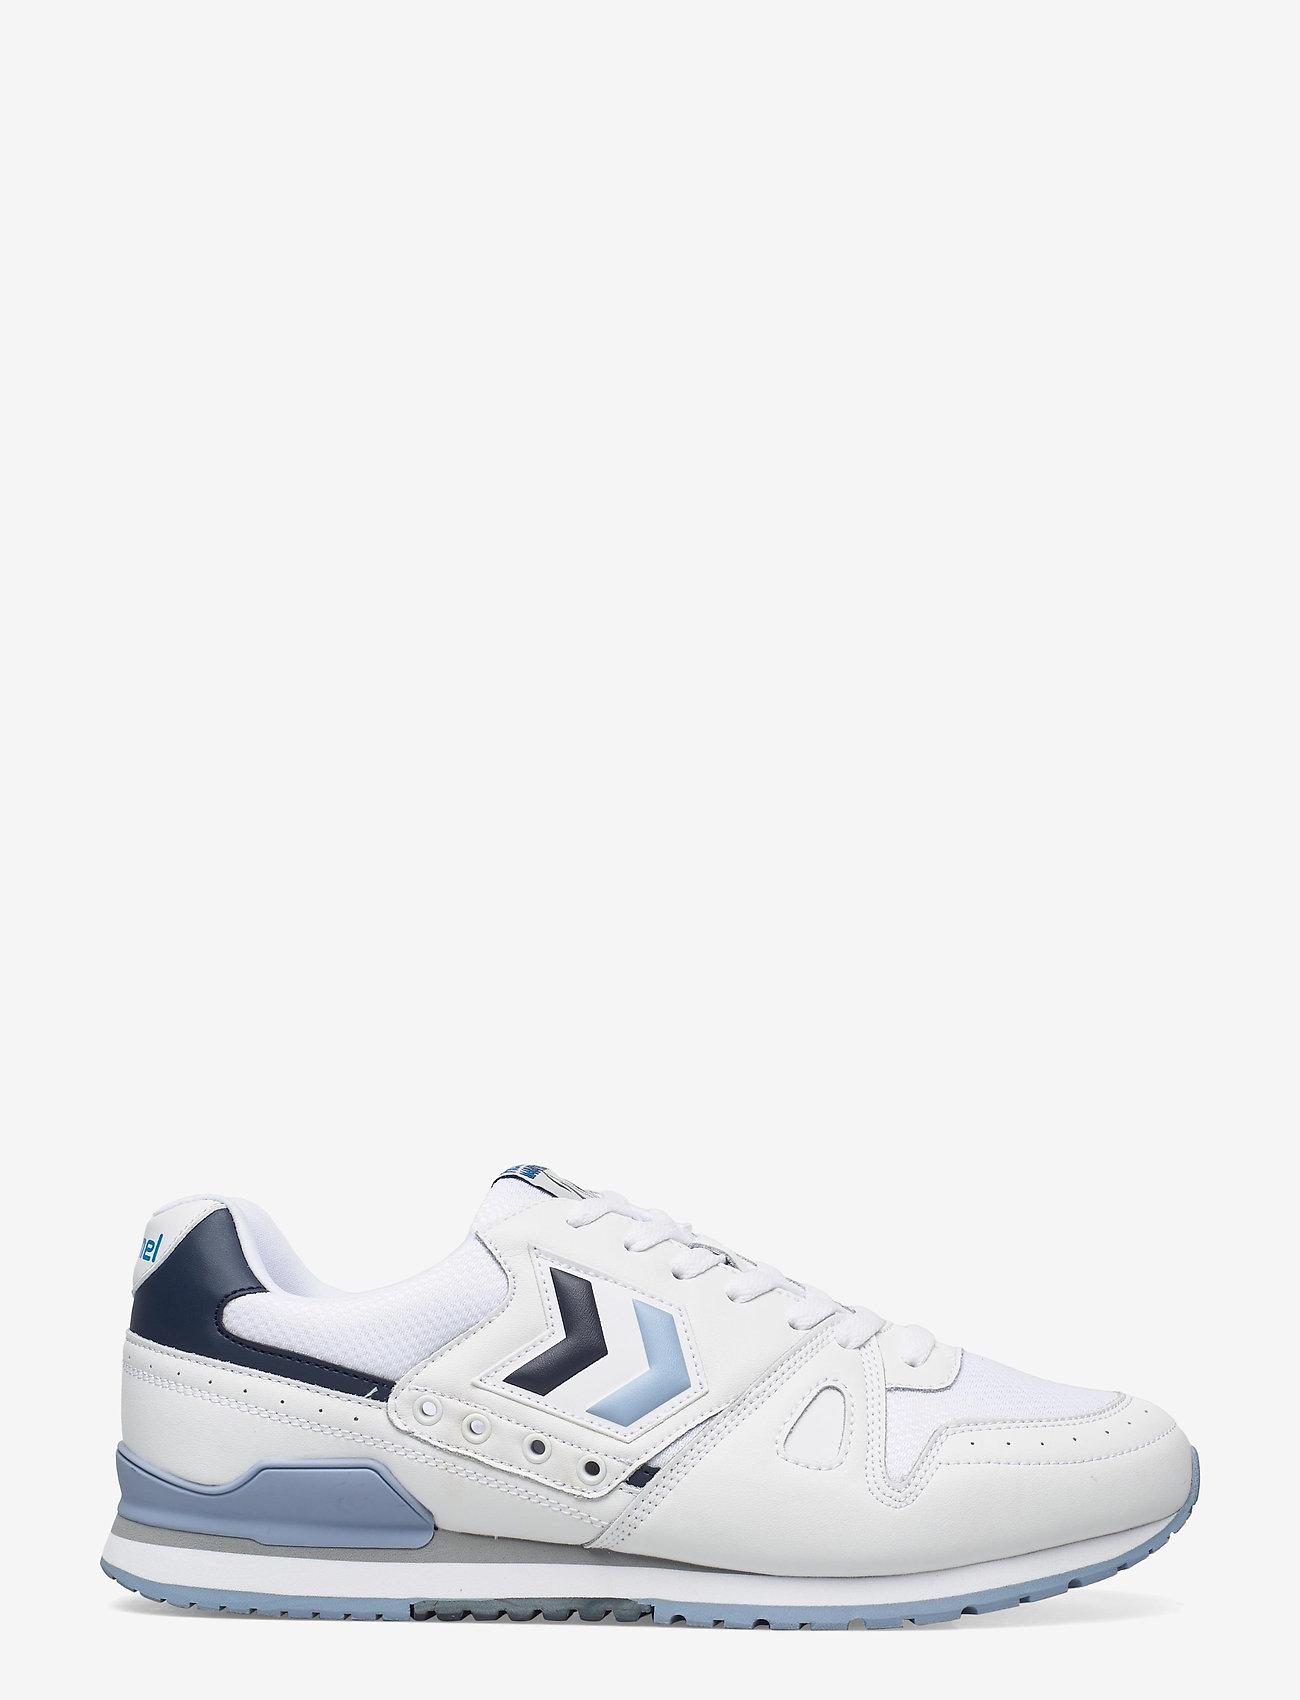 Hummel - MARATHONA VEGAN ARCHIVE - laag sneakers - black/white - 0